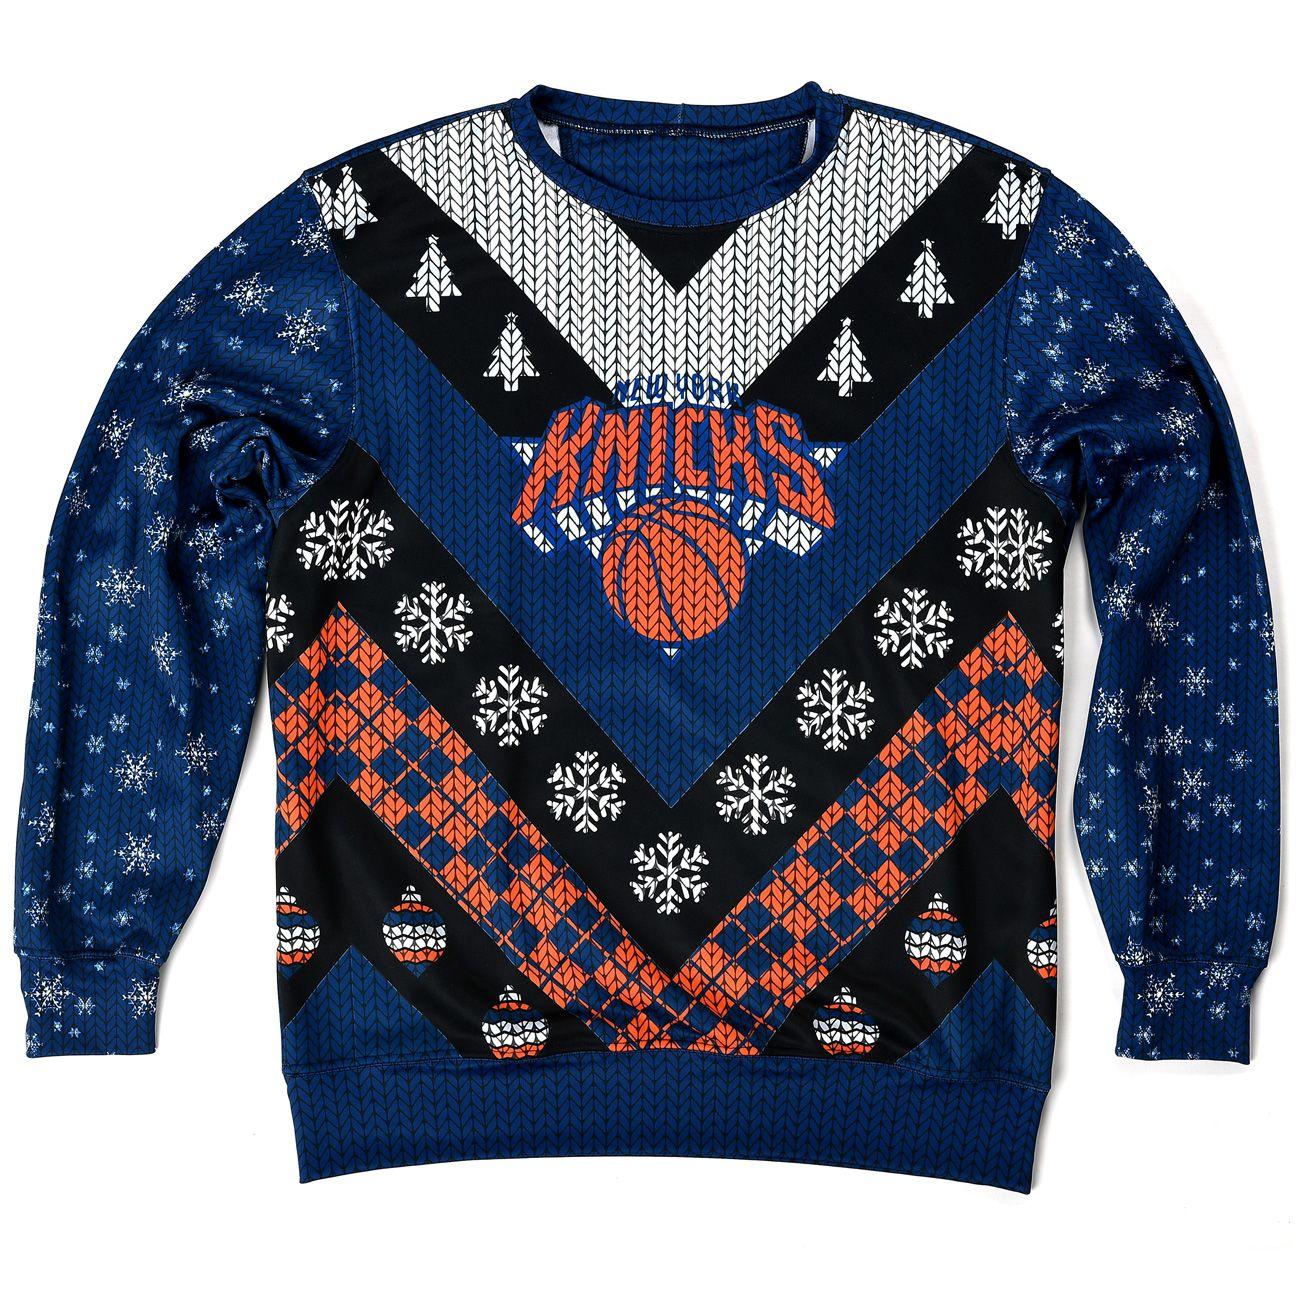 knicks ugly sweater